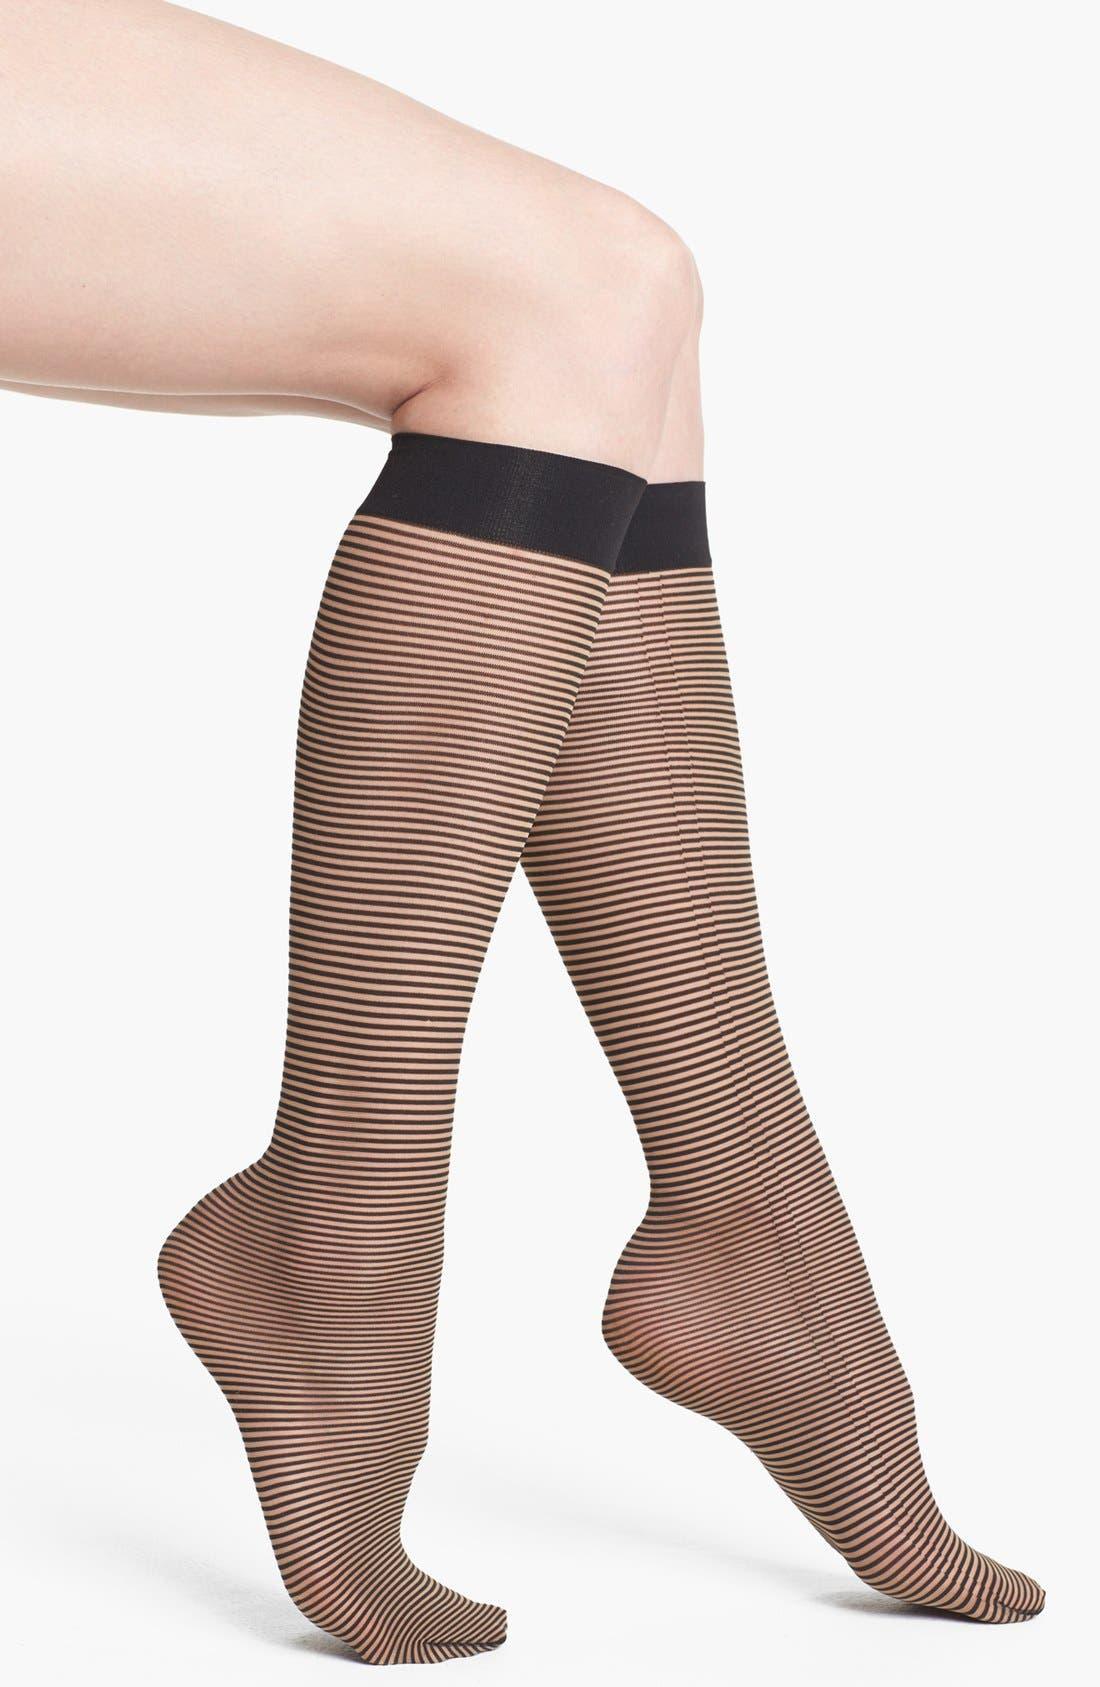 Alternate Image 1 Selected - Wolford 'Rayure' Knee High Socks